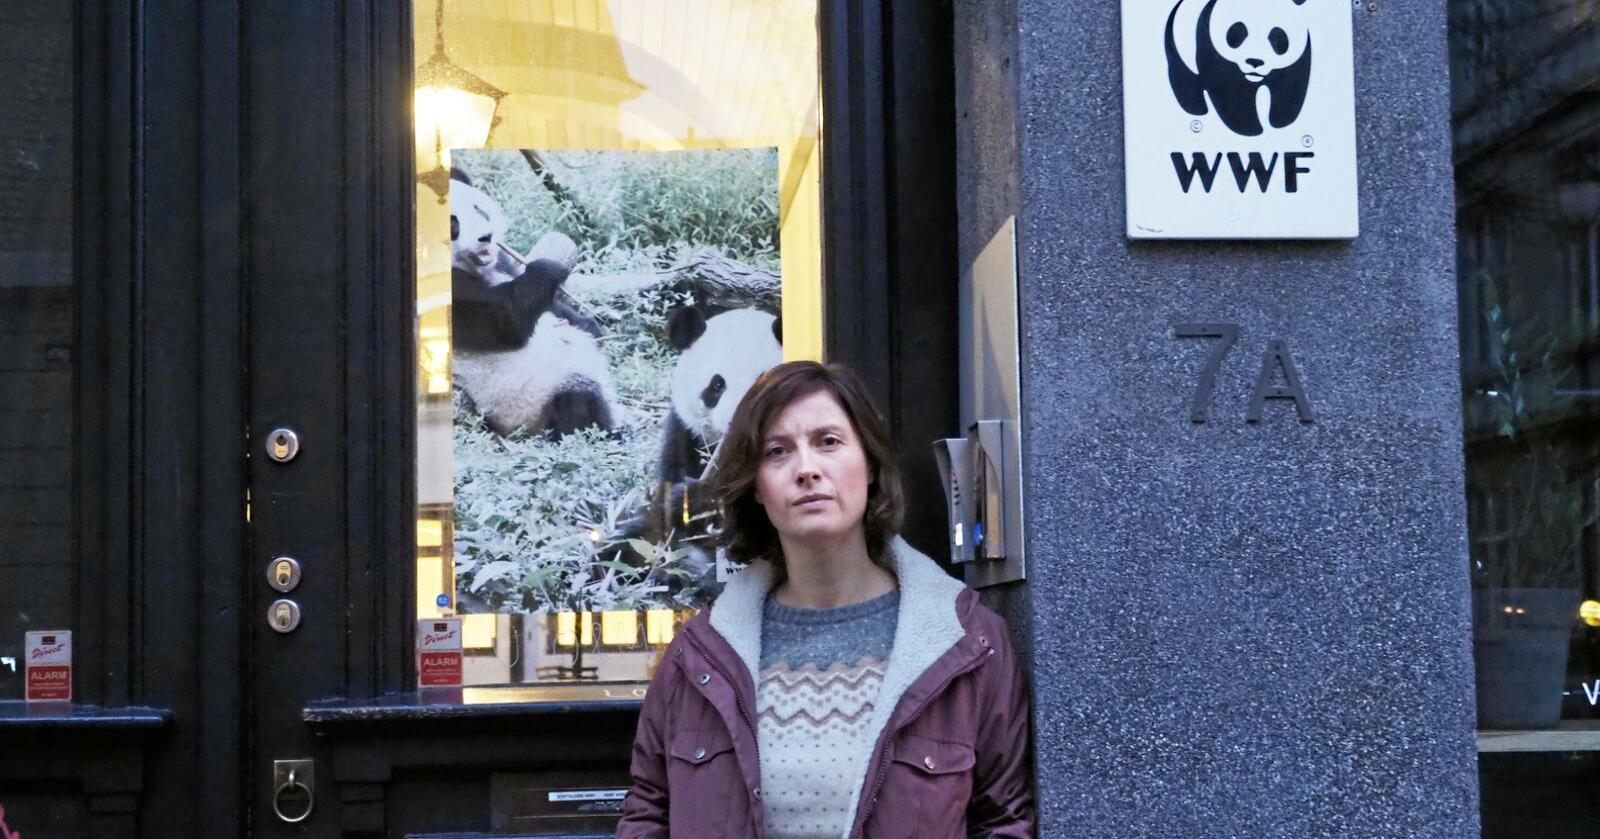 Ingrid Lomelde, miljøpolitisk leder i WWF, vil vite hvor grensa går i ulveforvaltningen. Foto: Siri Juell Rasmussen